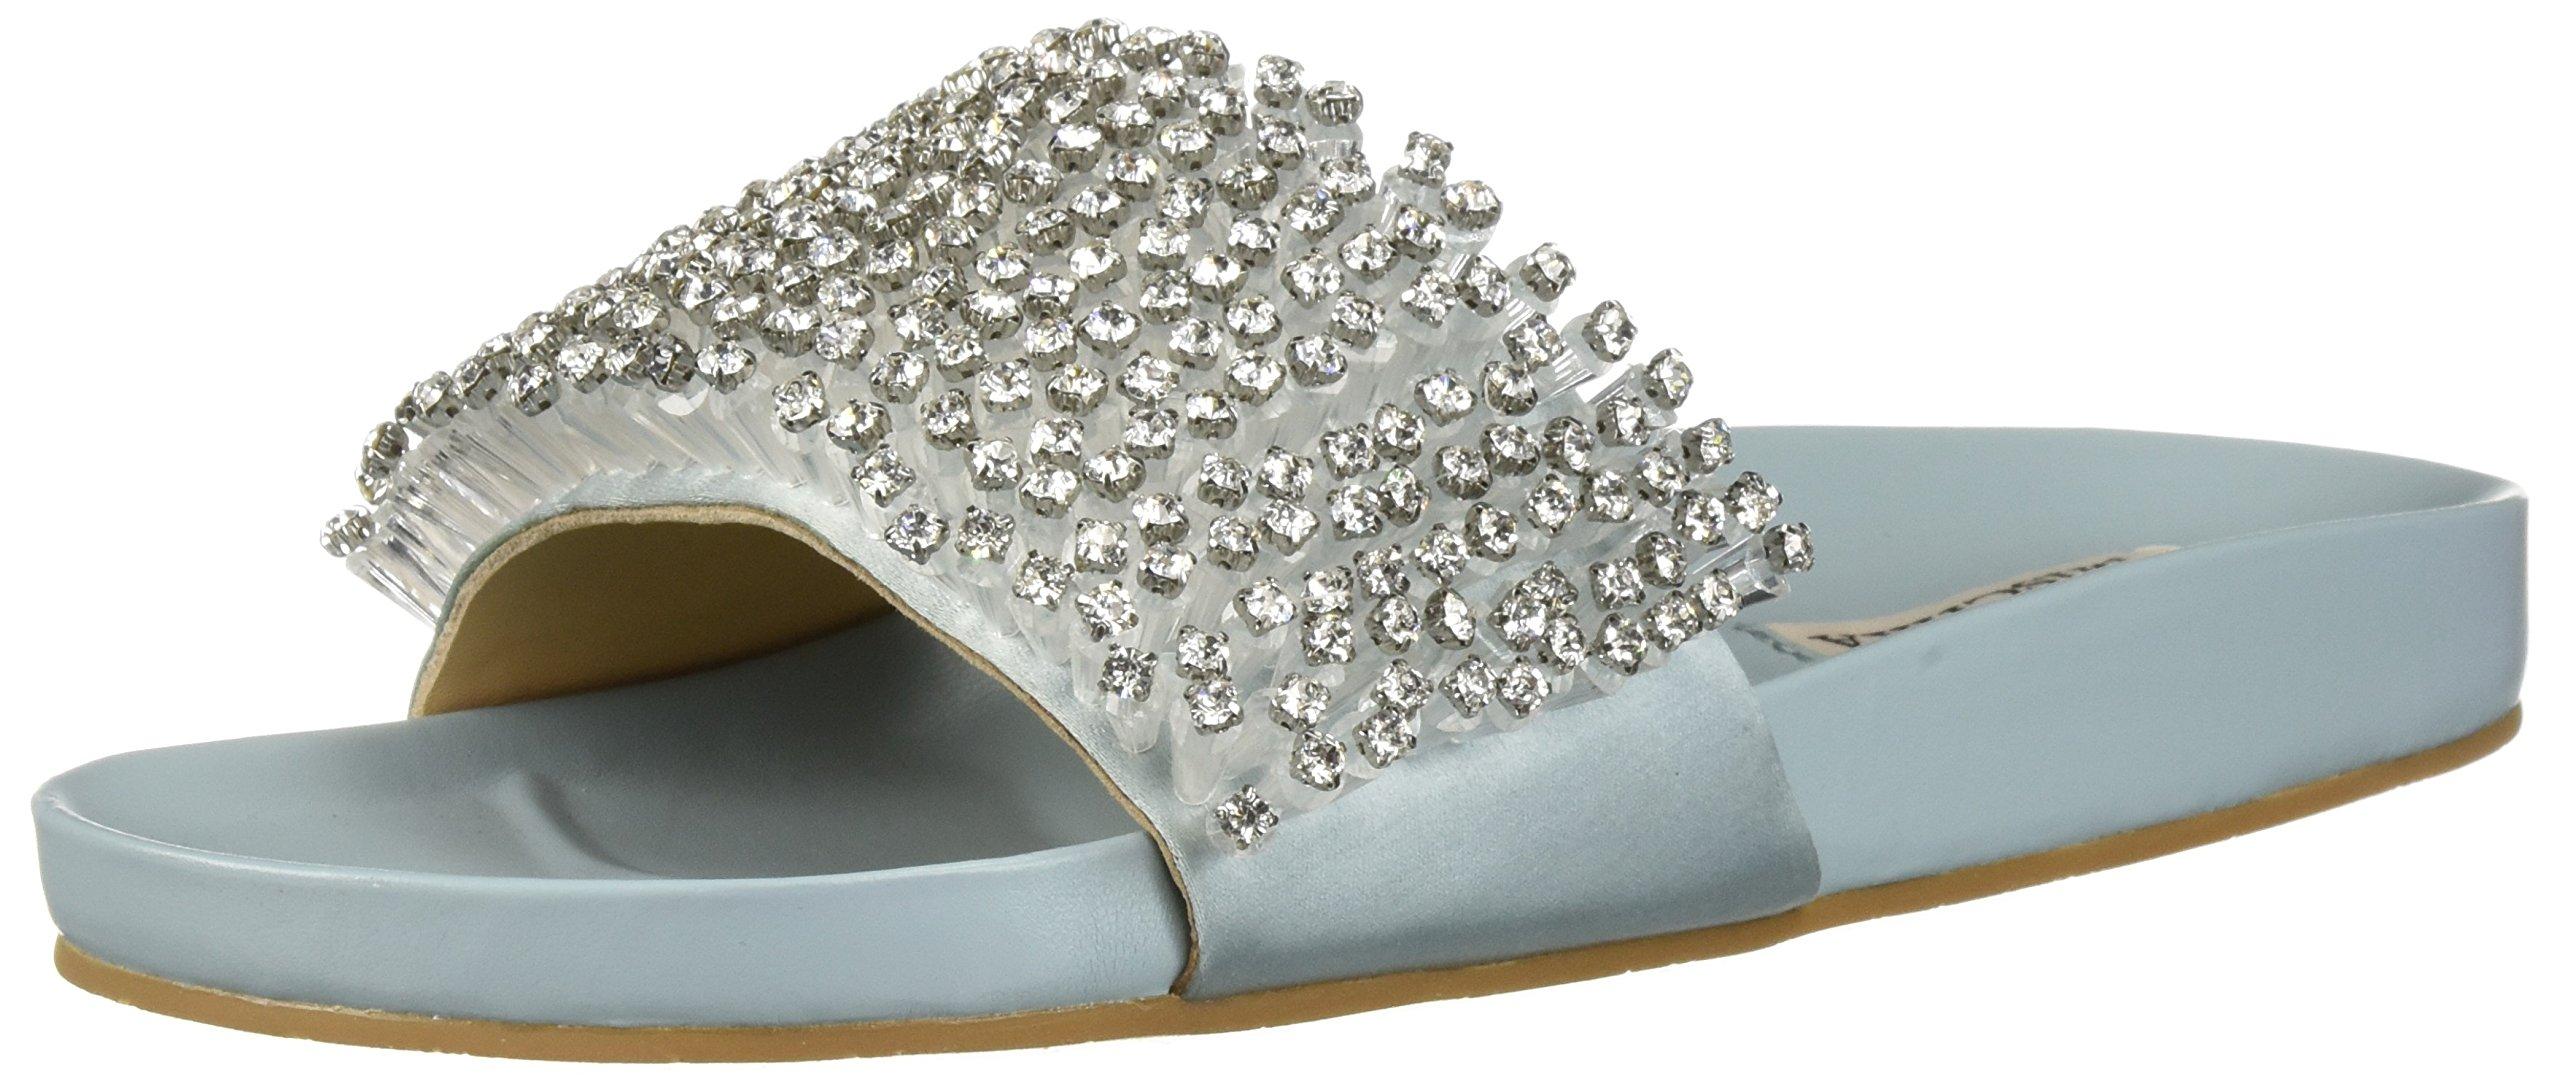 Badgley Mischka Women's Horton Flat Sandal, Crystal Blue, 10 M US